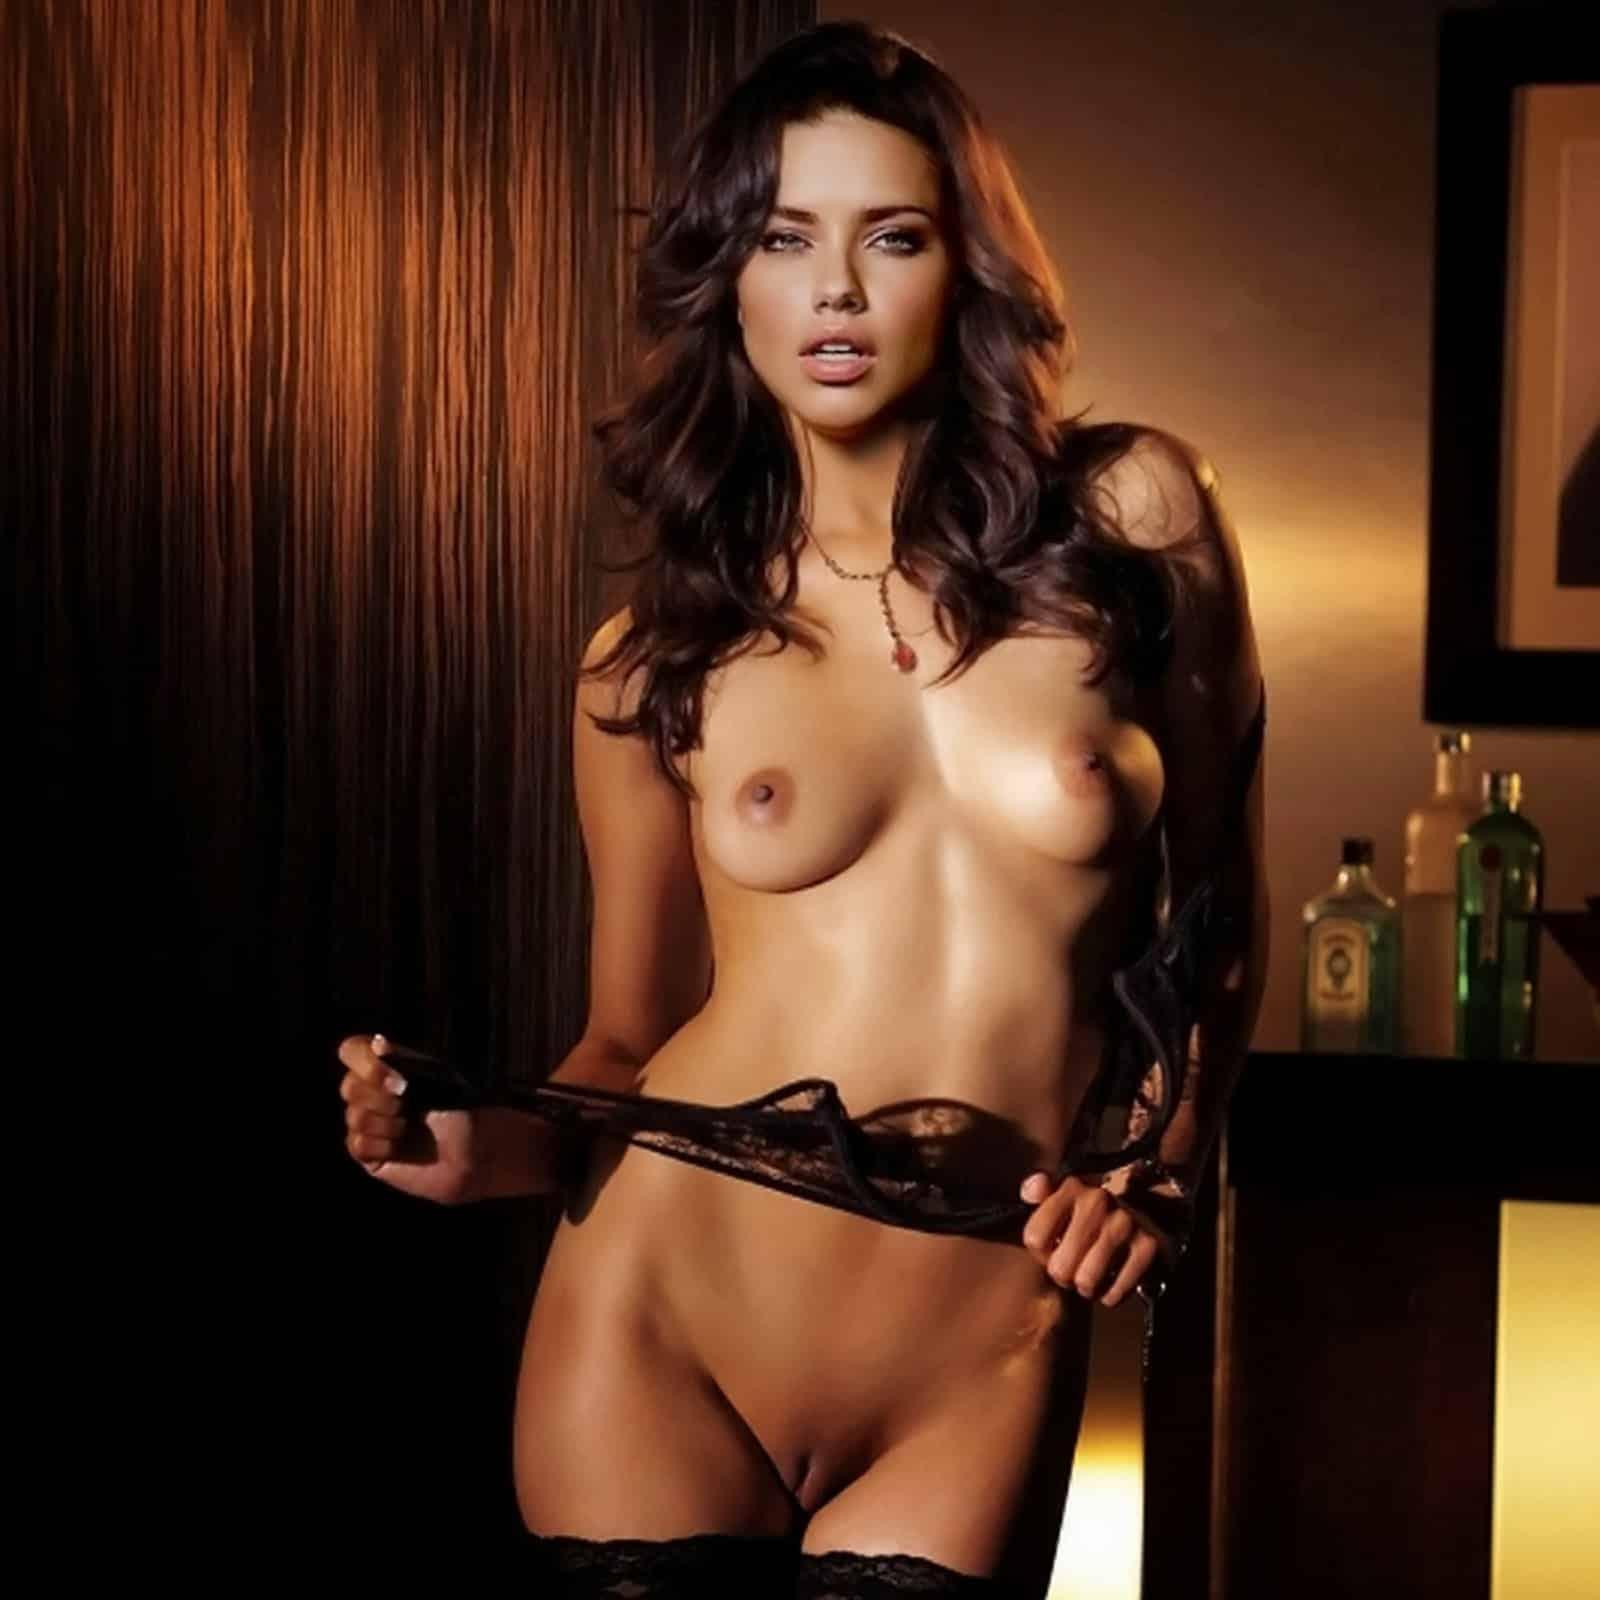 Model adriana lima nude